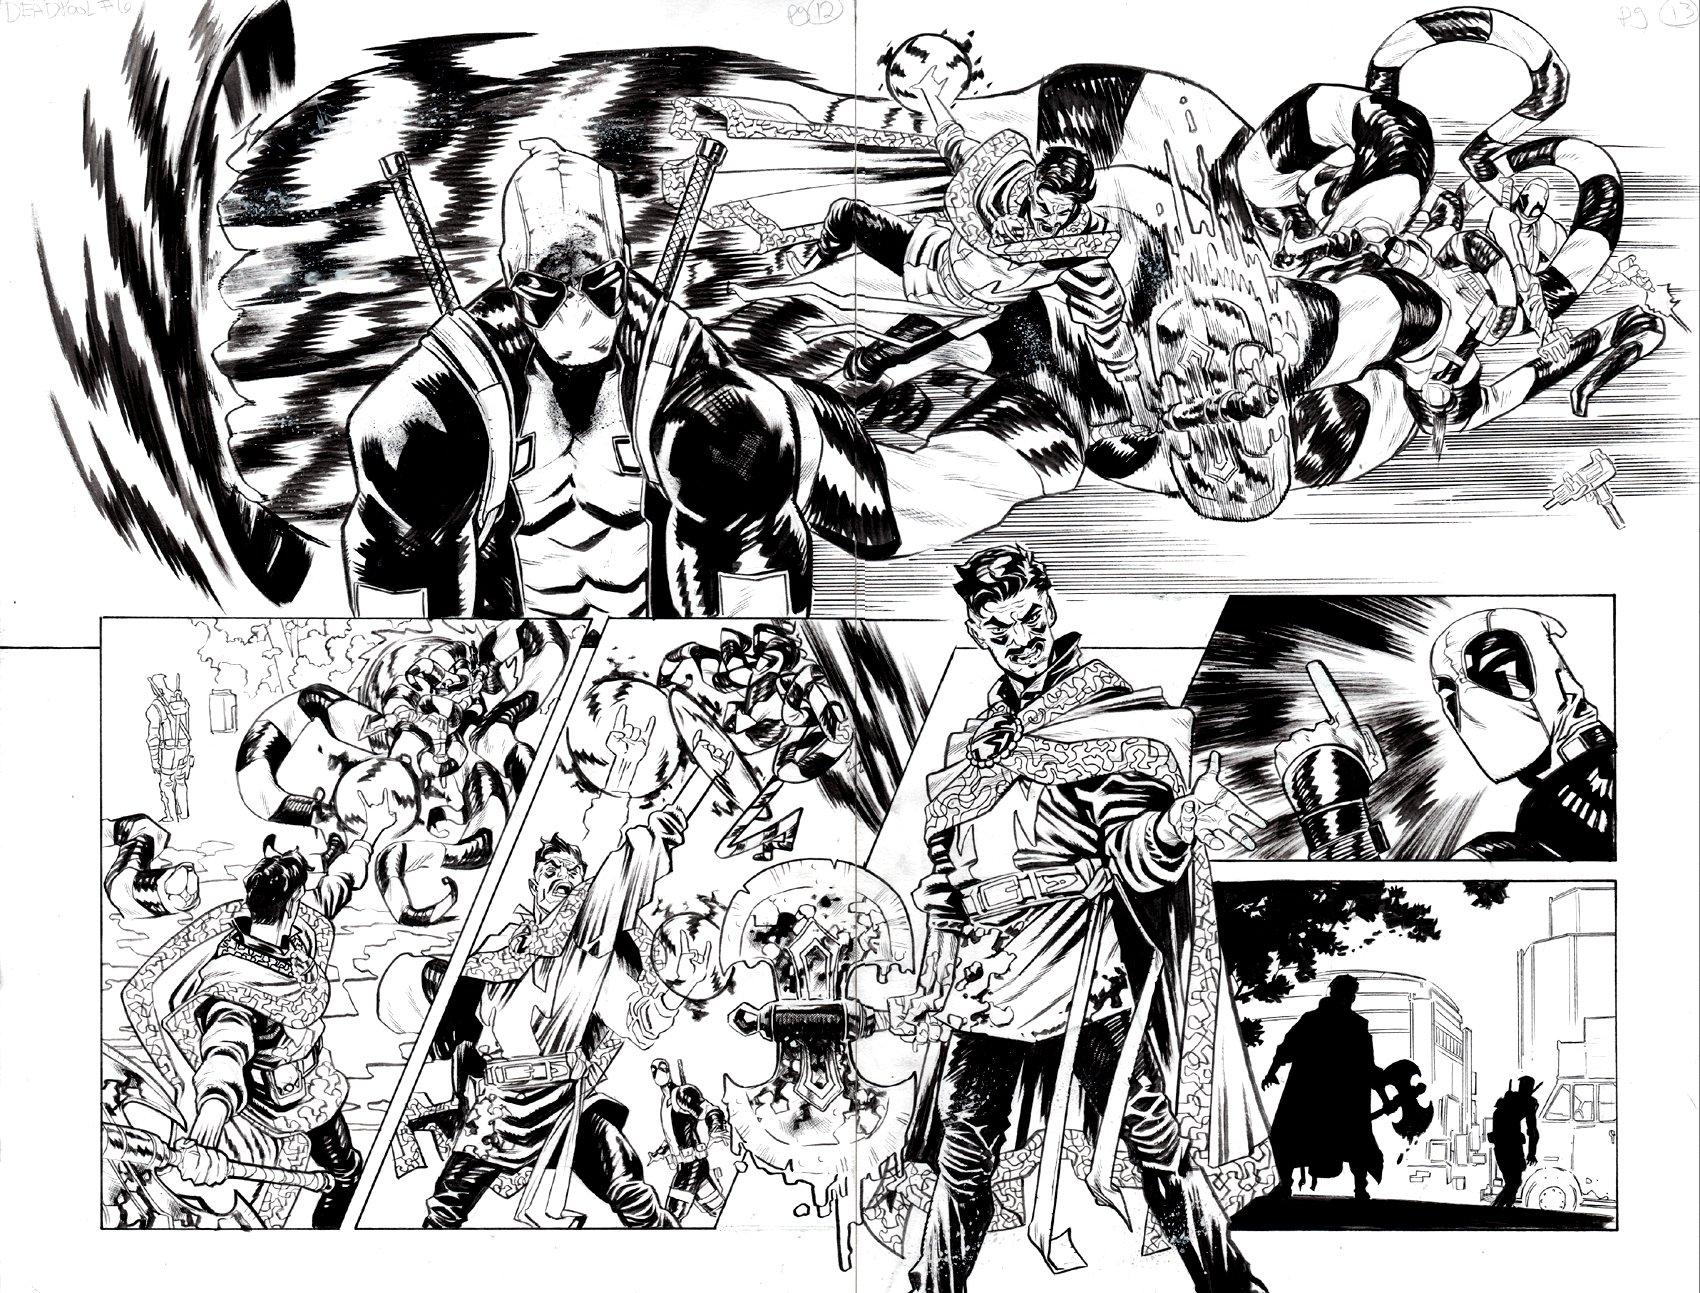 Deadpool #6 p 12-13 Double Spread Splash (AWESOME DR STRANGE BATTLING MONSTER AS DEADPOOL WATCHES!) 2018